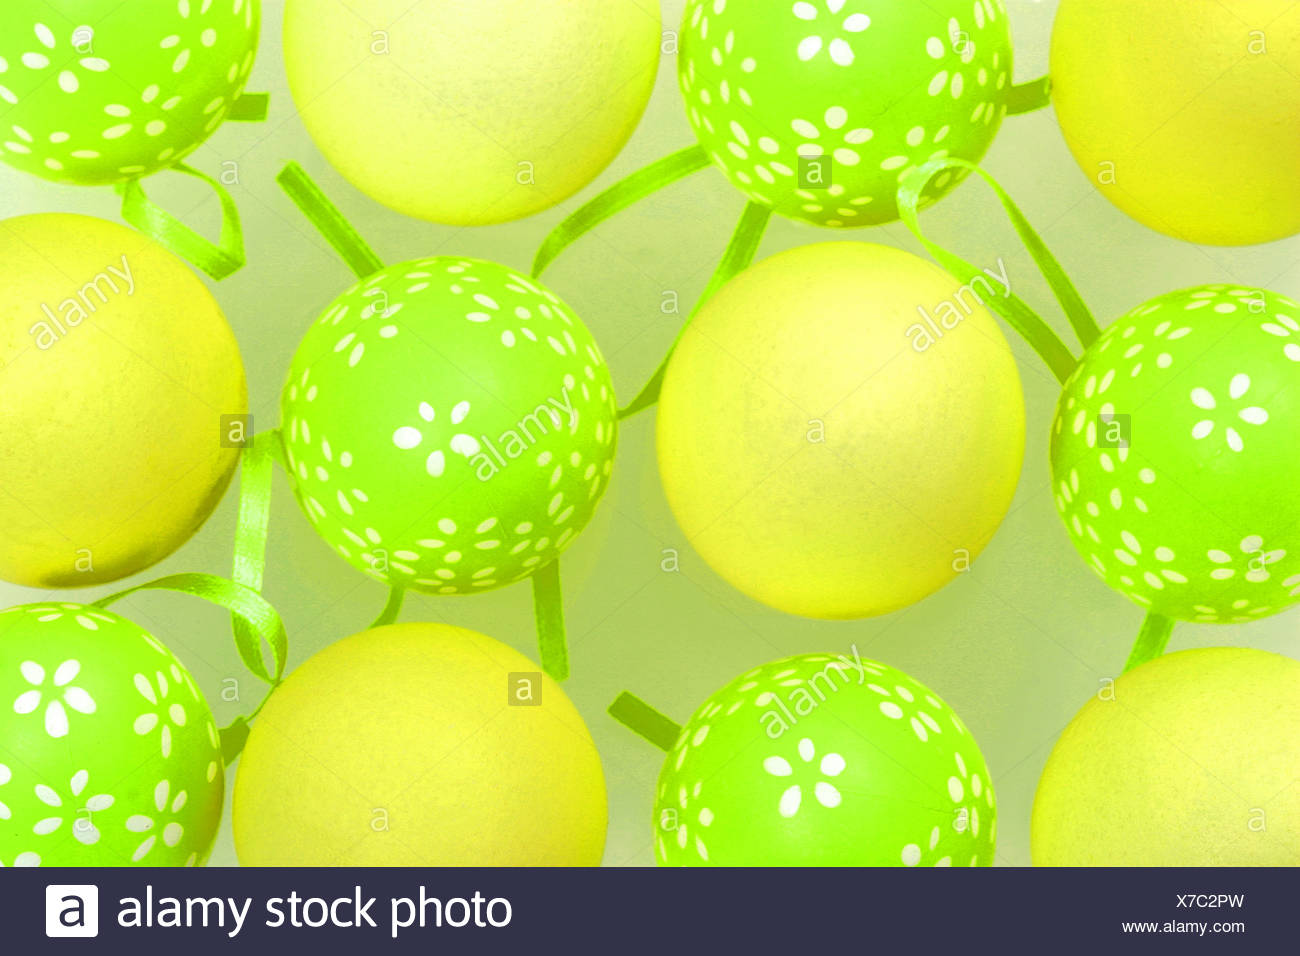 Eggs painted green eggs white flower pattern, arranged alternately pale yellow eggs green ribbons inbetween them - Stock Image